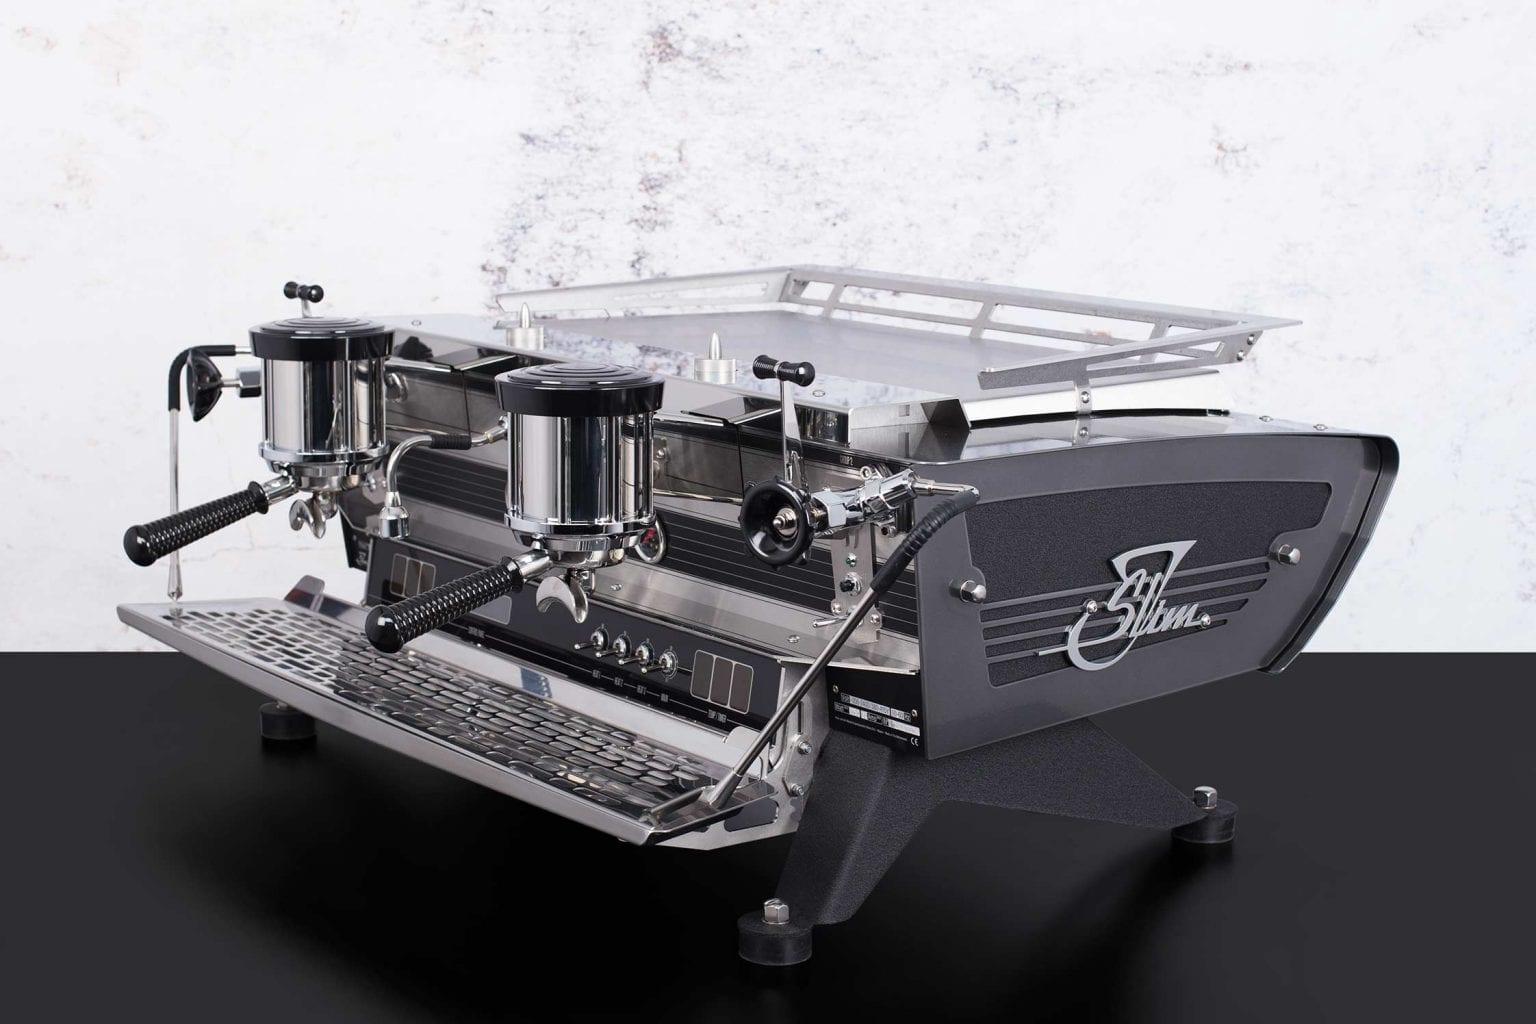 Commercial Espresso Machine Slim Jim Standard